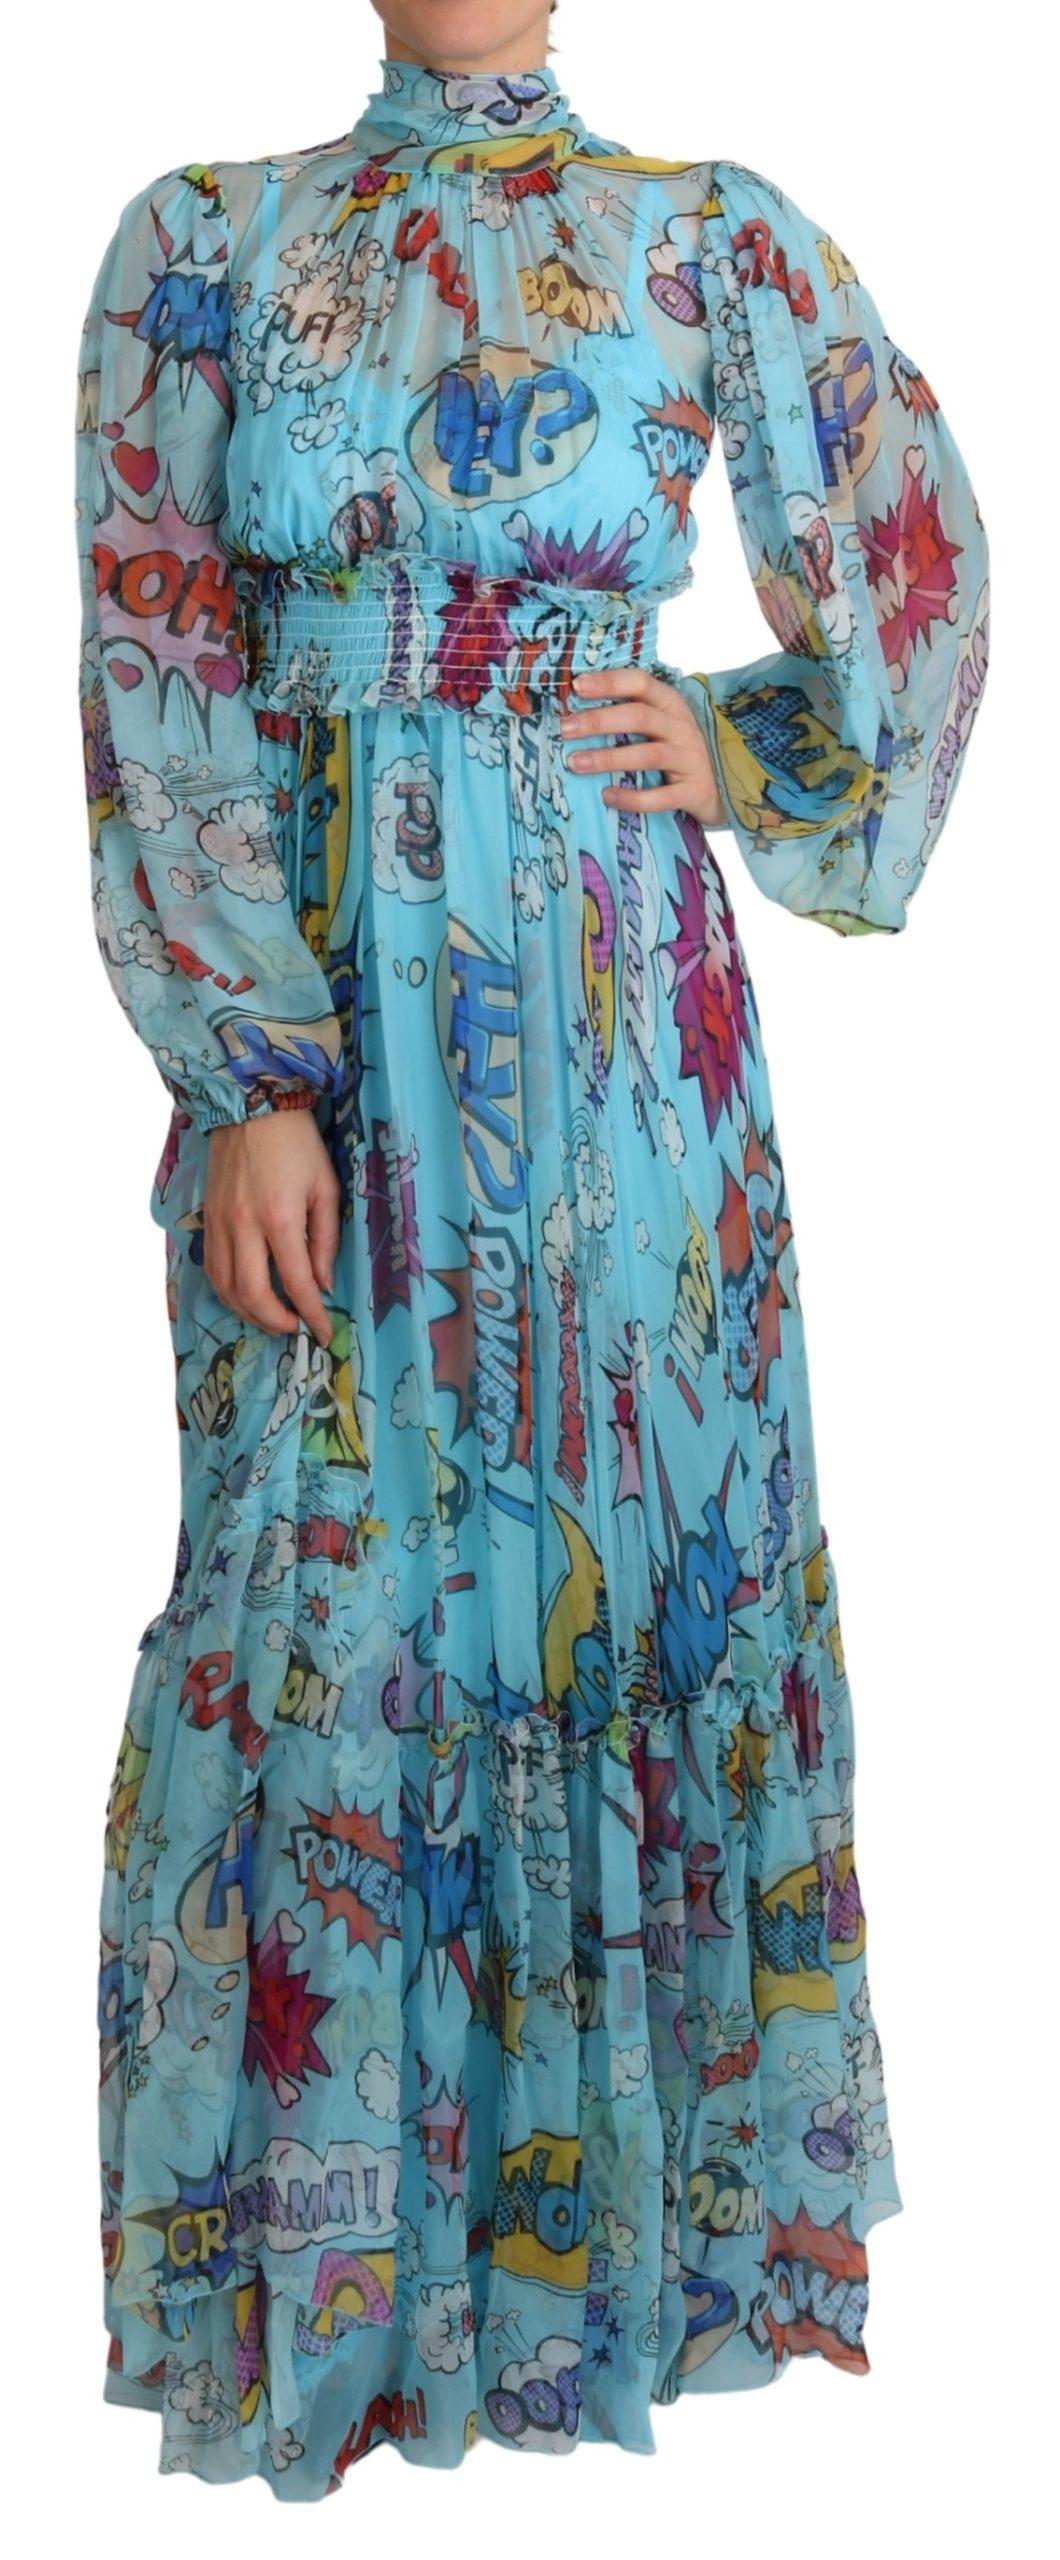 Dolce & Gabbana Women's Cartoon Print Pleated Dress Blue DR2573 - IT38 XS